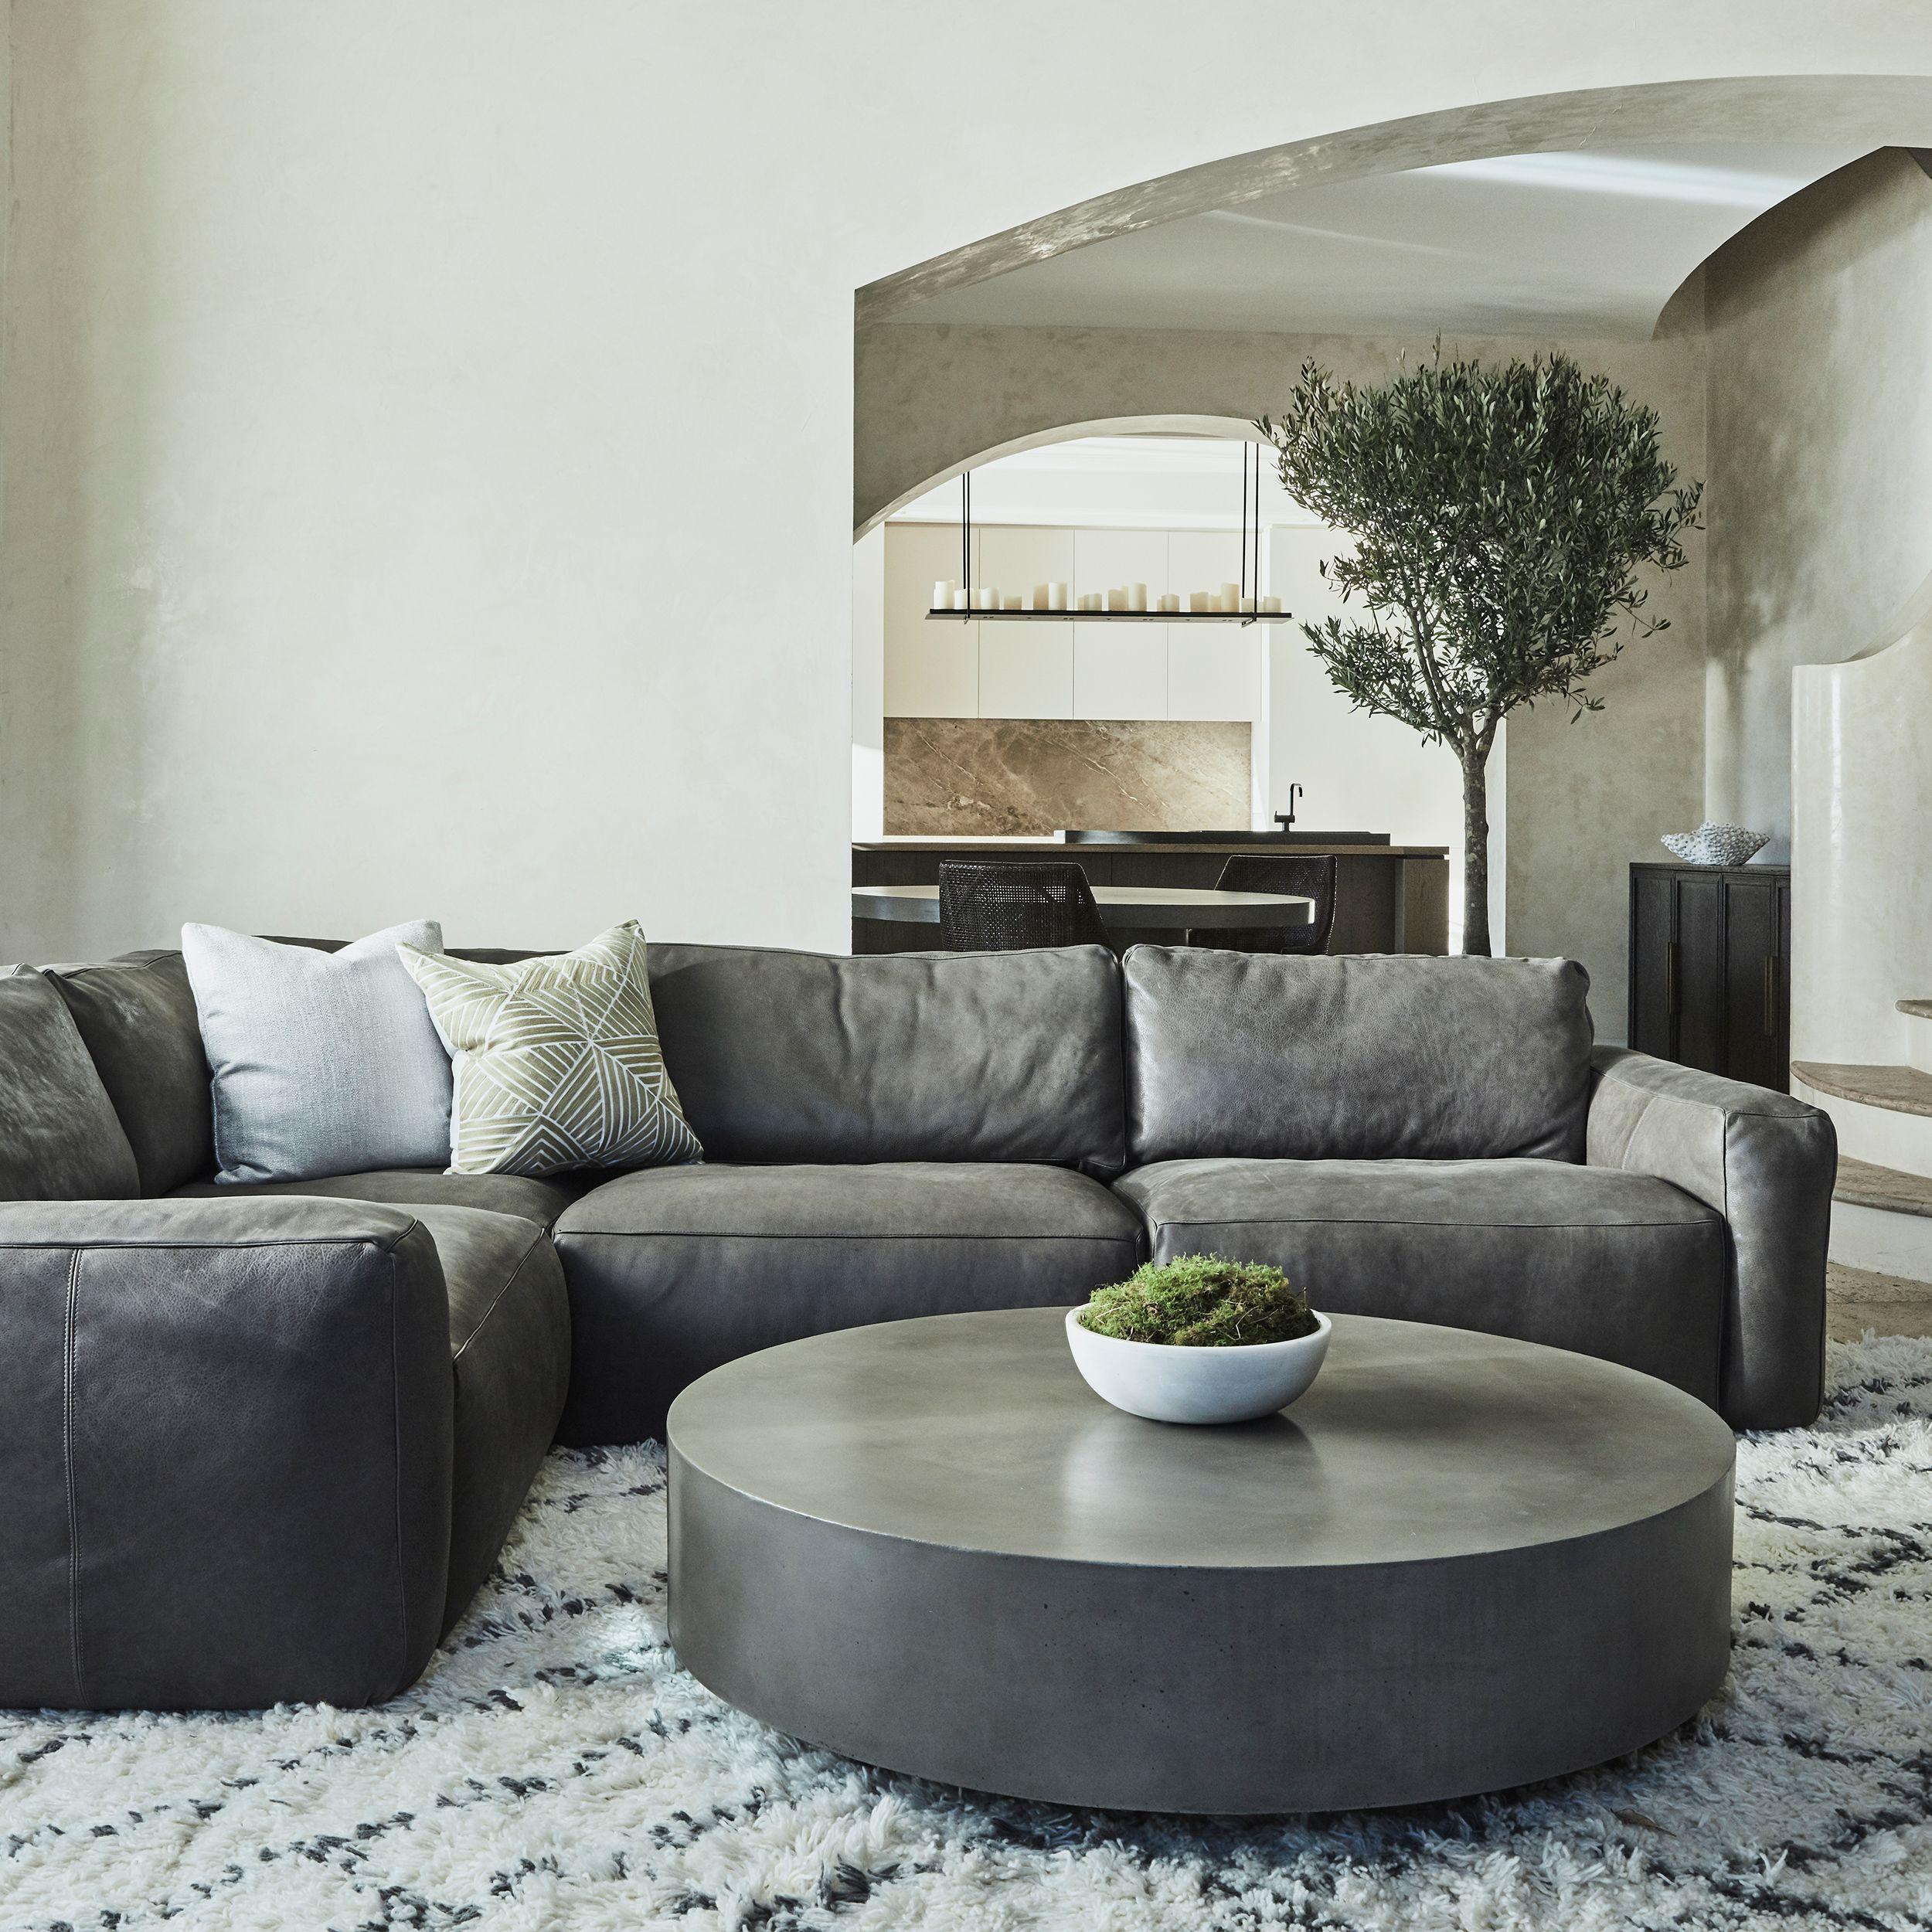 Monaco Concrete Coffee Table Round Coffee Table Living Room Concrete Coffee Table Living Room Coffee Table [ 2500 x 2500 Pixel ]